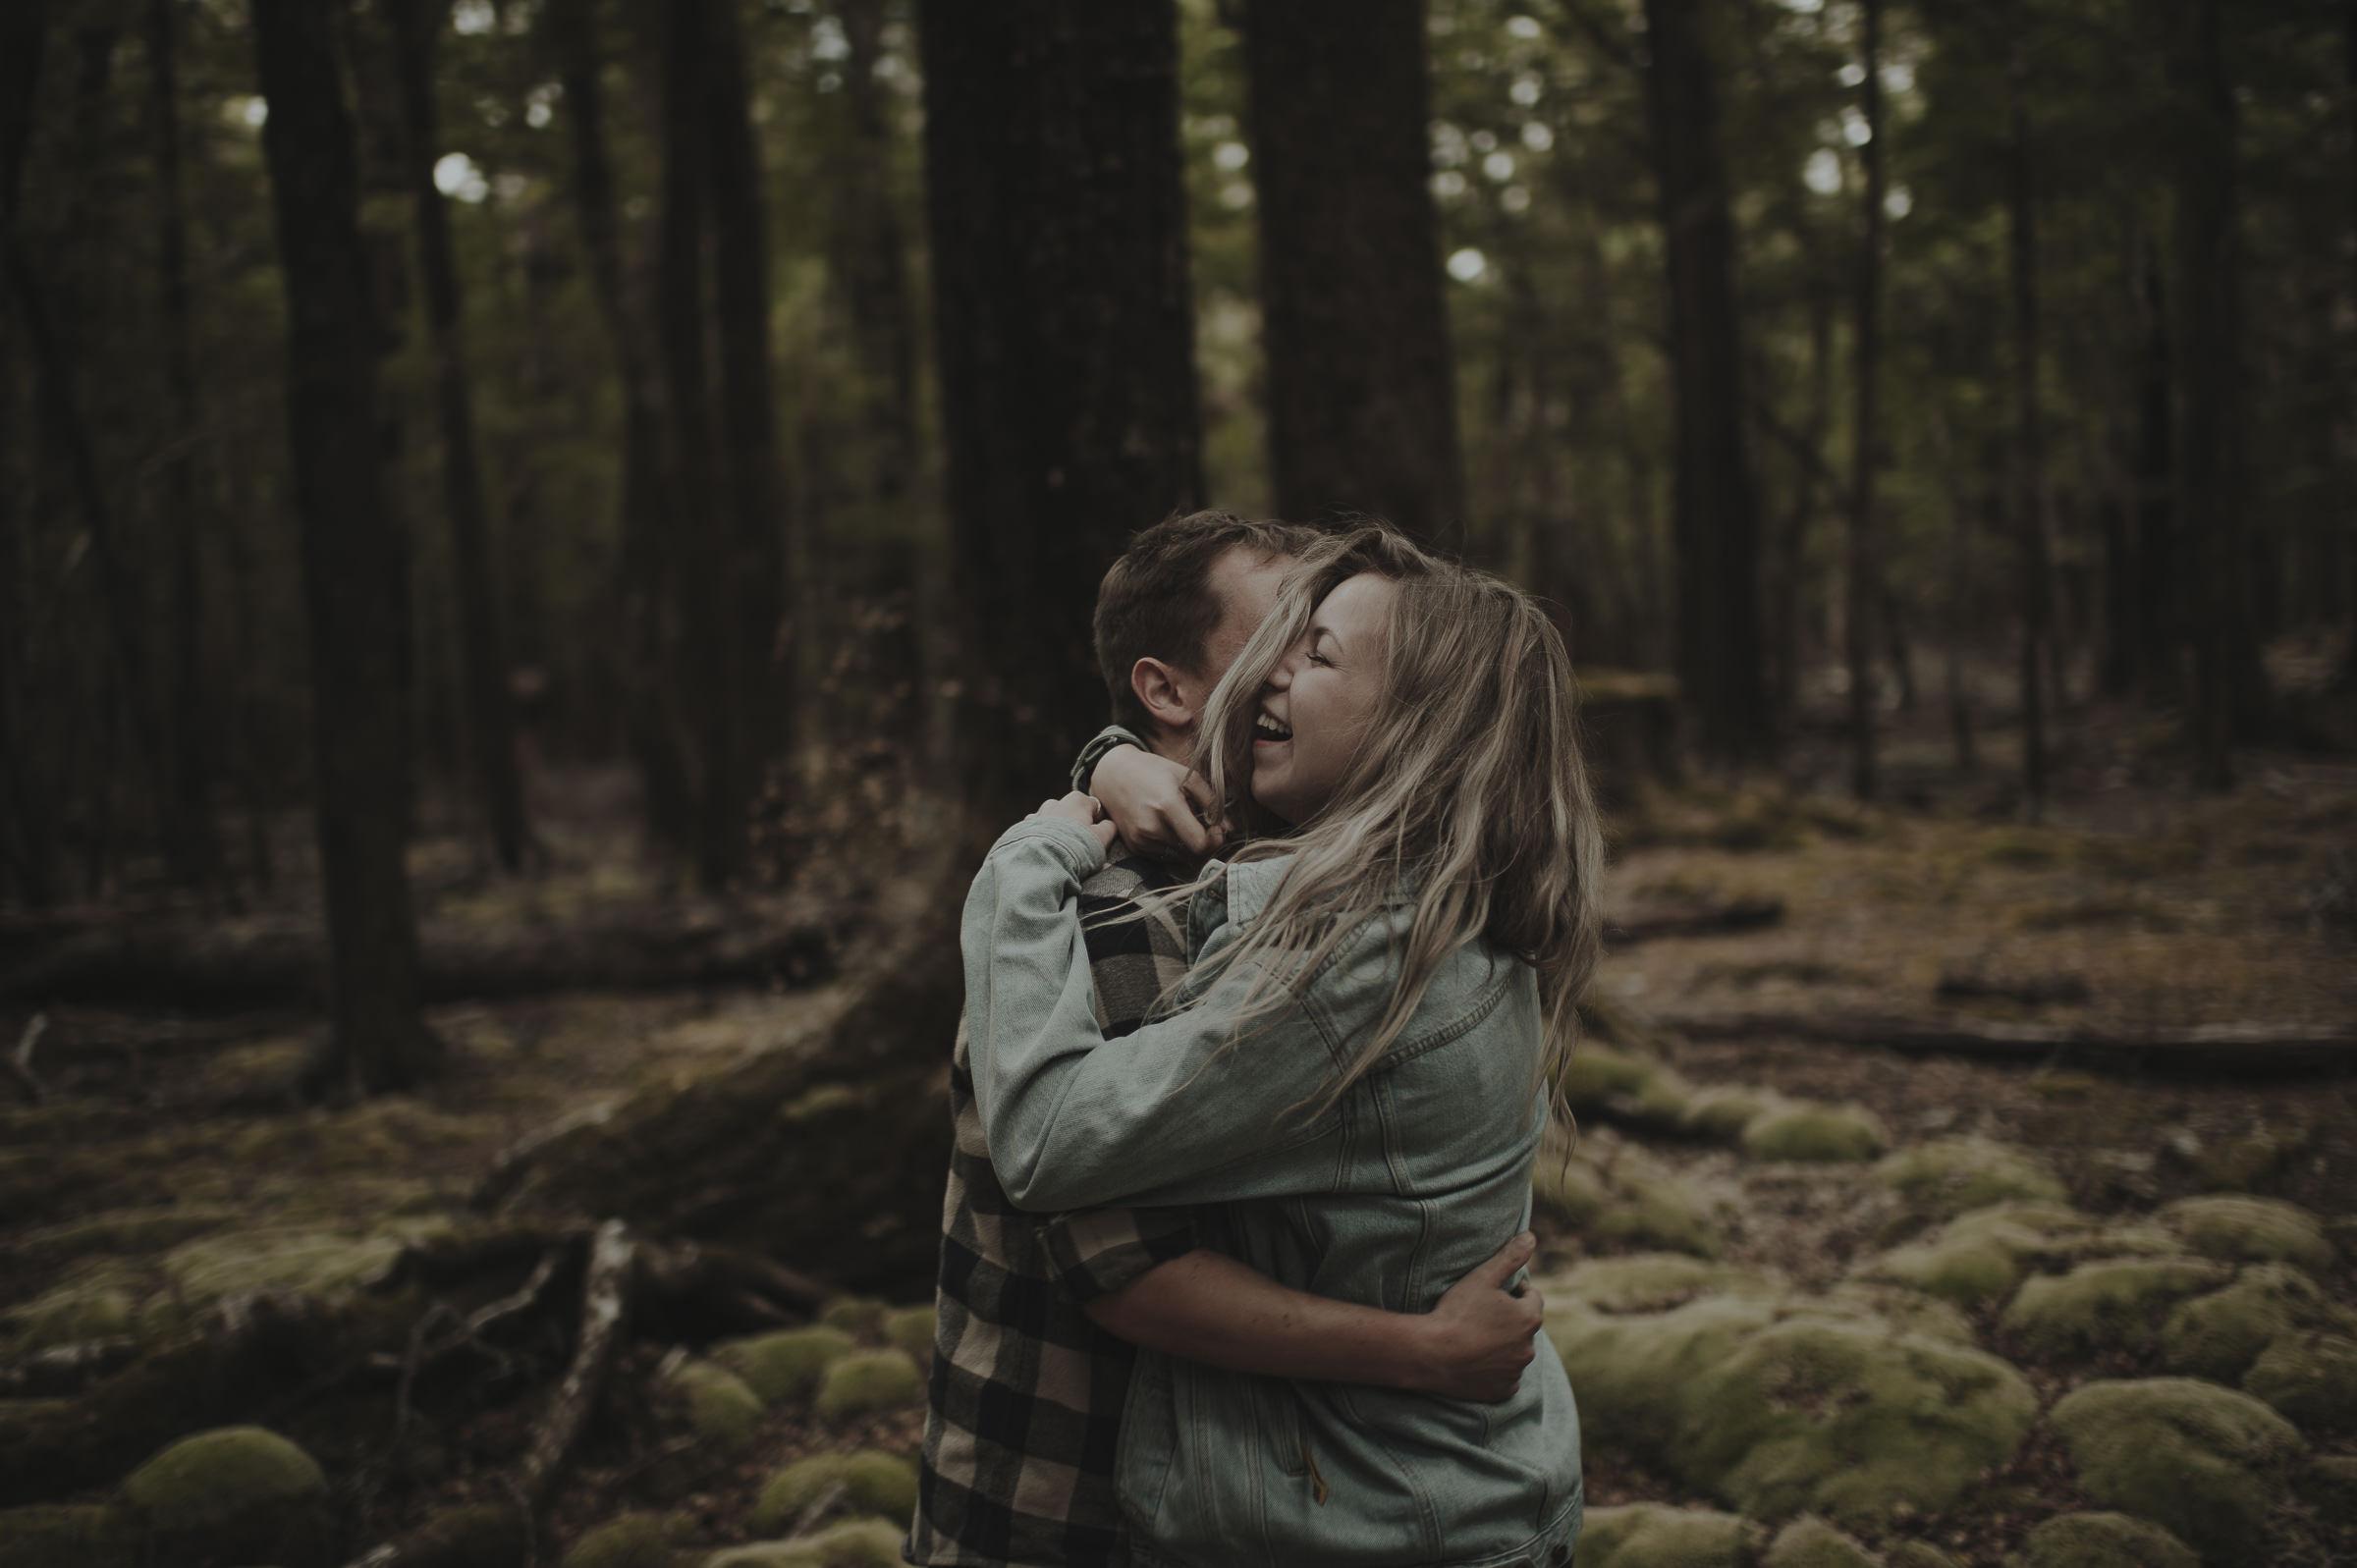 Katie_Hamish_Glenorchy_New_Zealand_Couple_Shoot-49.jpg